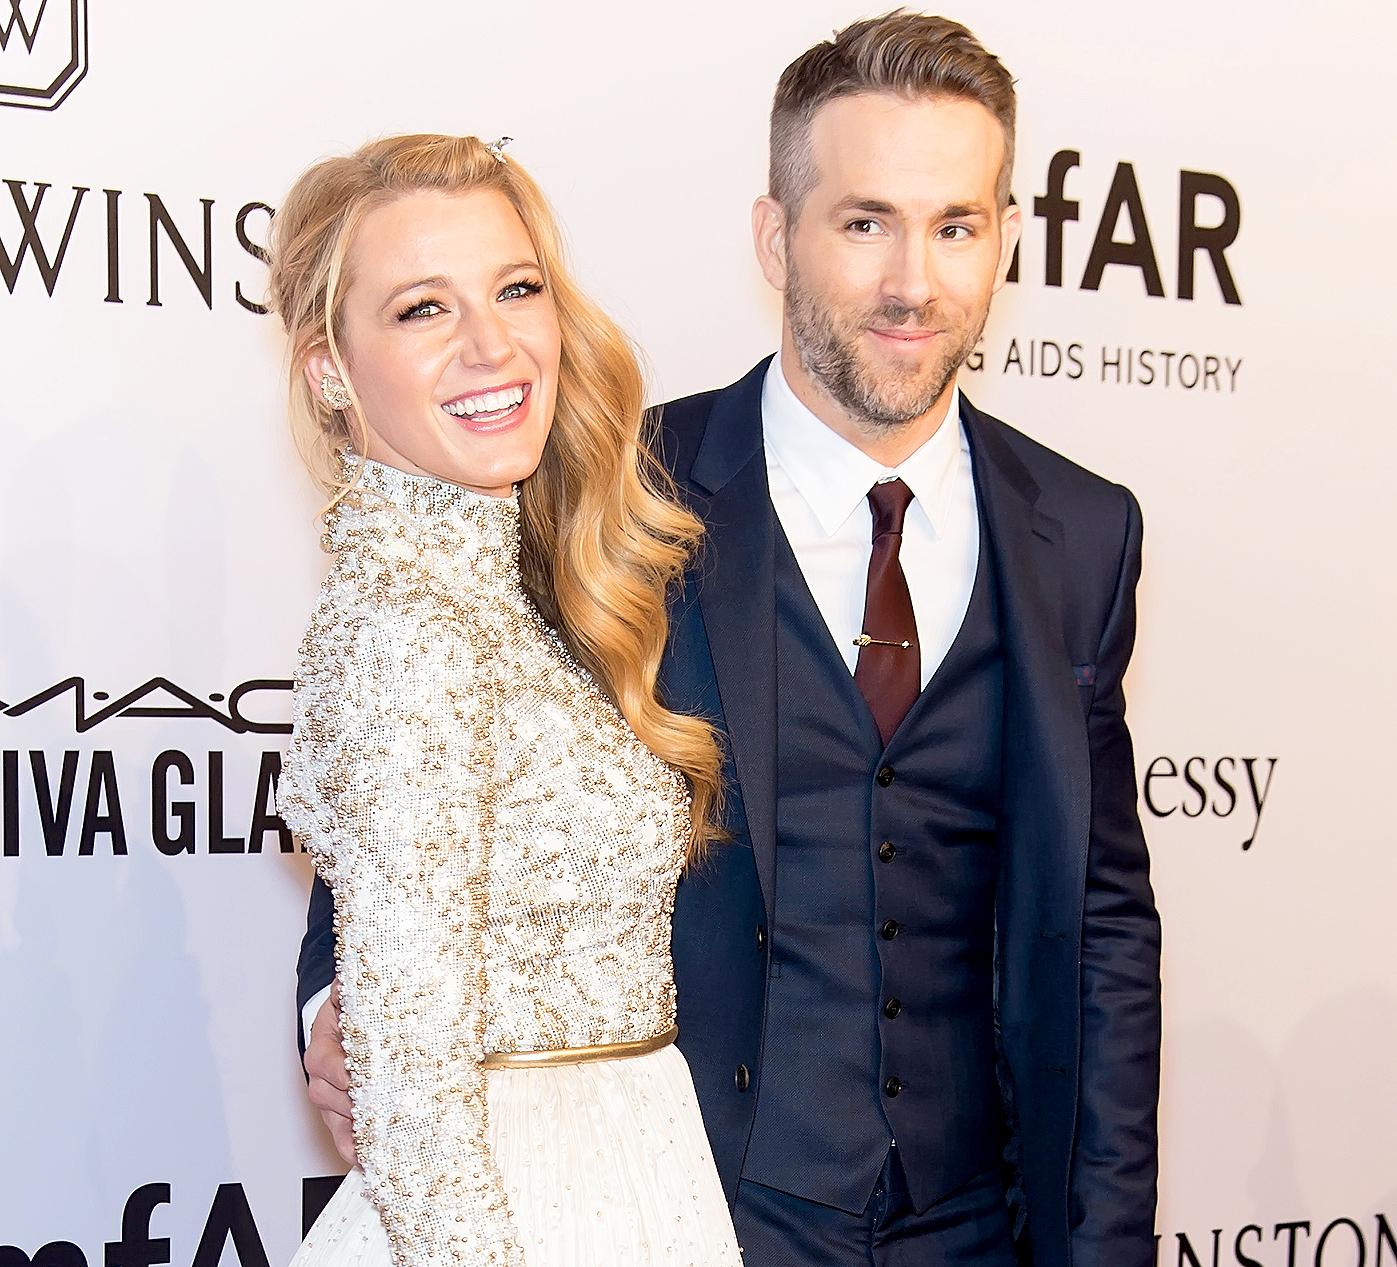 Blake Lively and Ryan Reynolds attend the 2016 amfAR New York Gala.